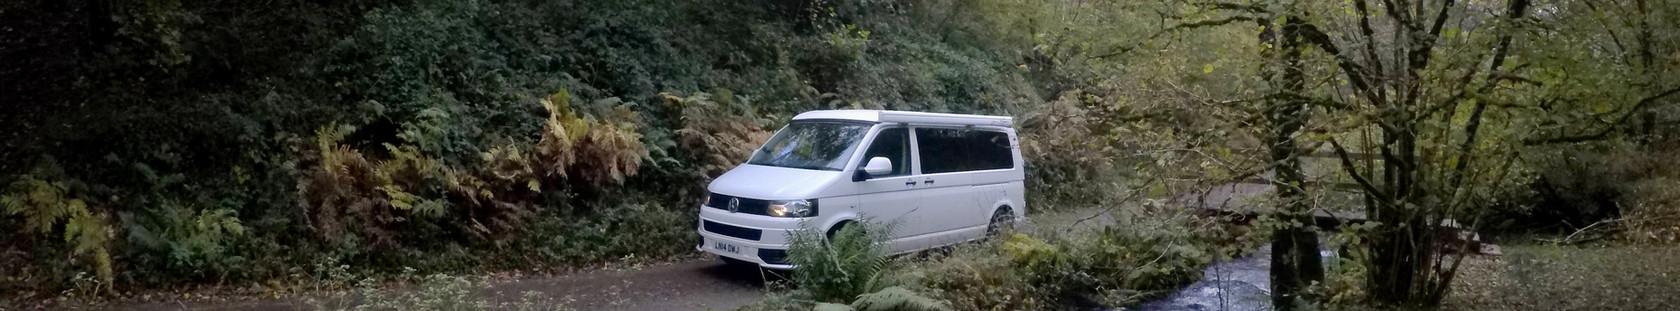 VW Campervan Hire Stream